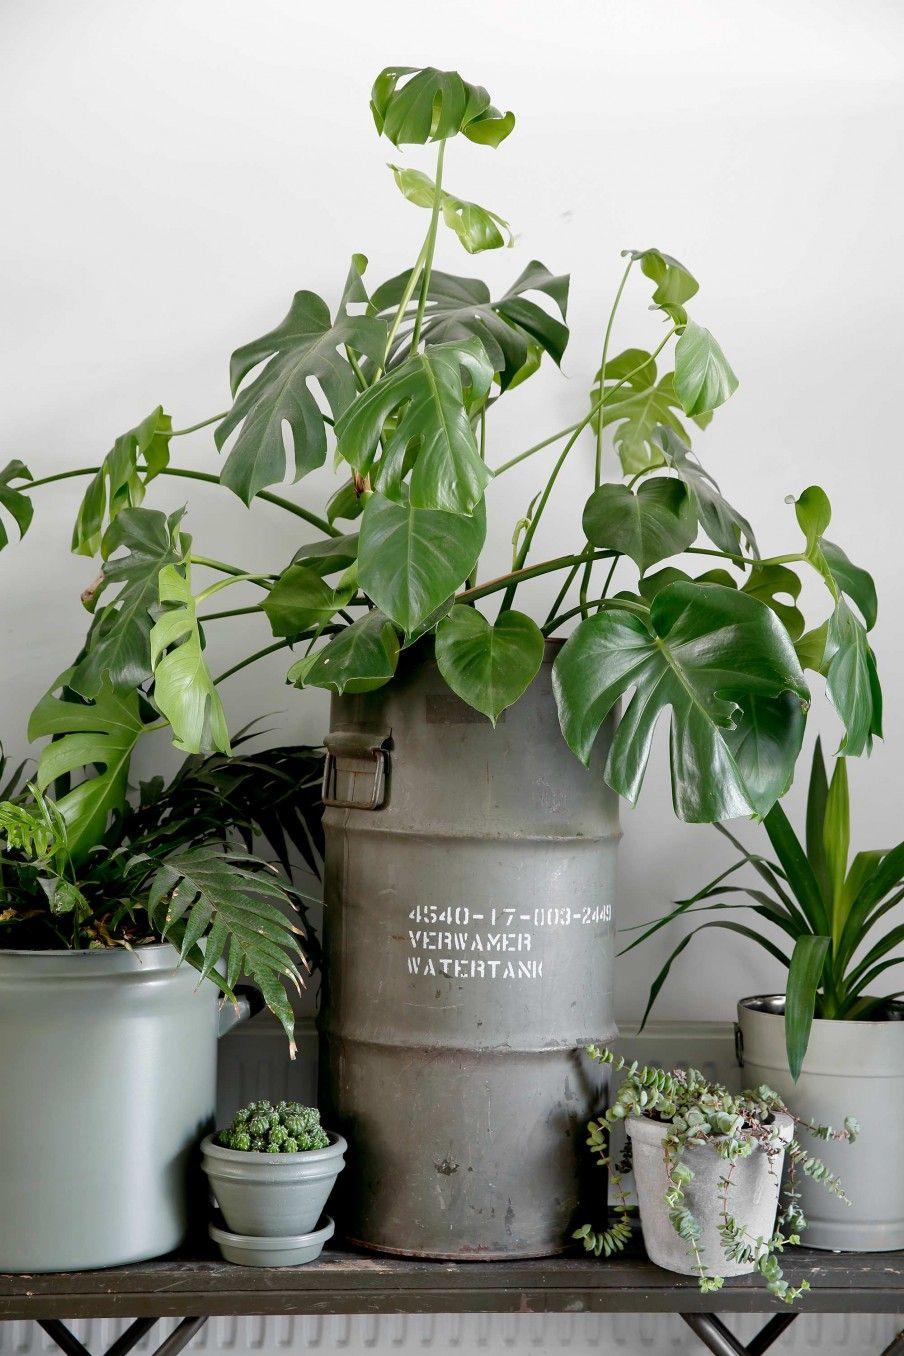 Plantenbankje